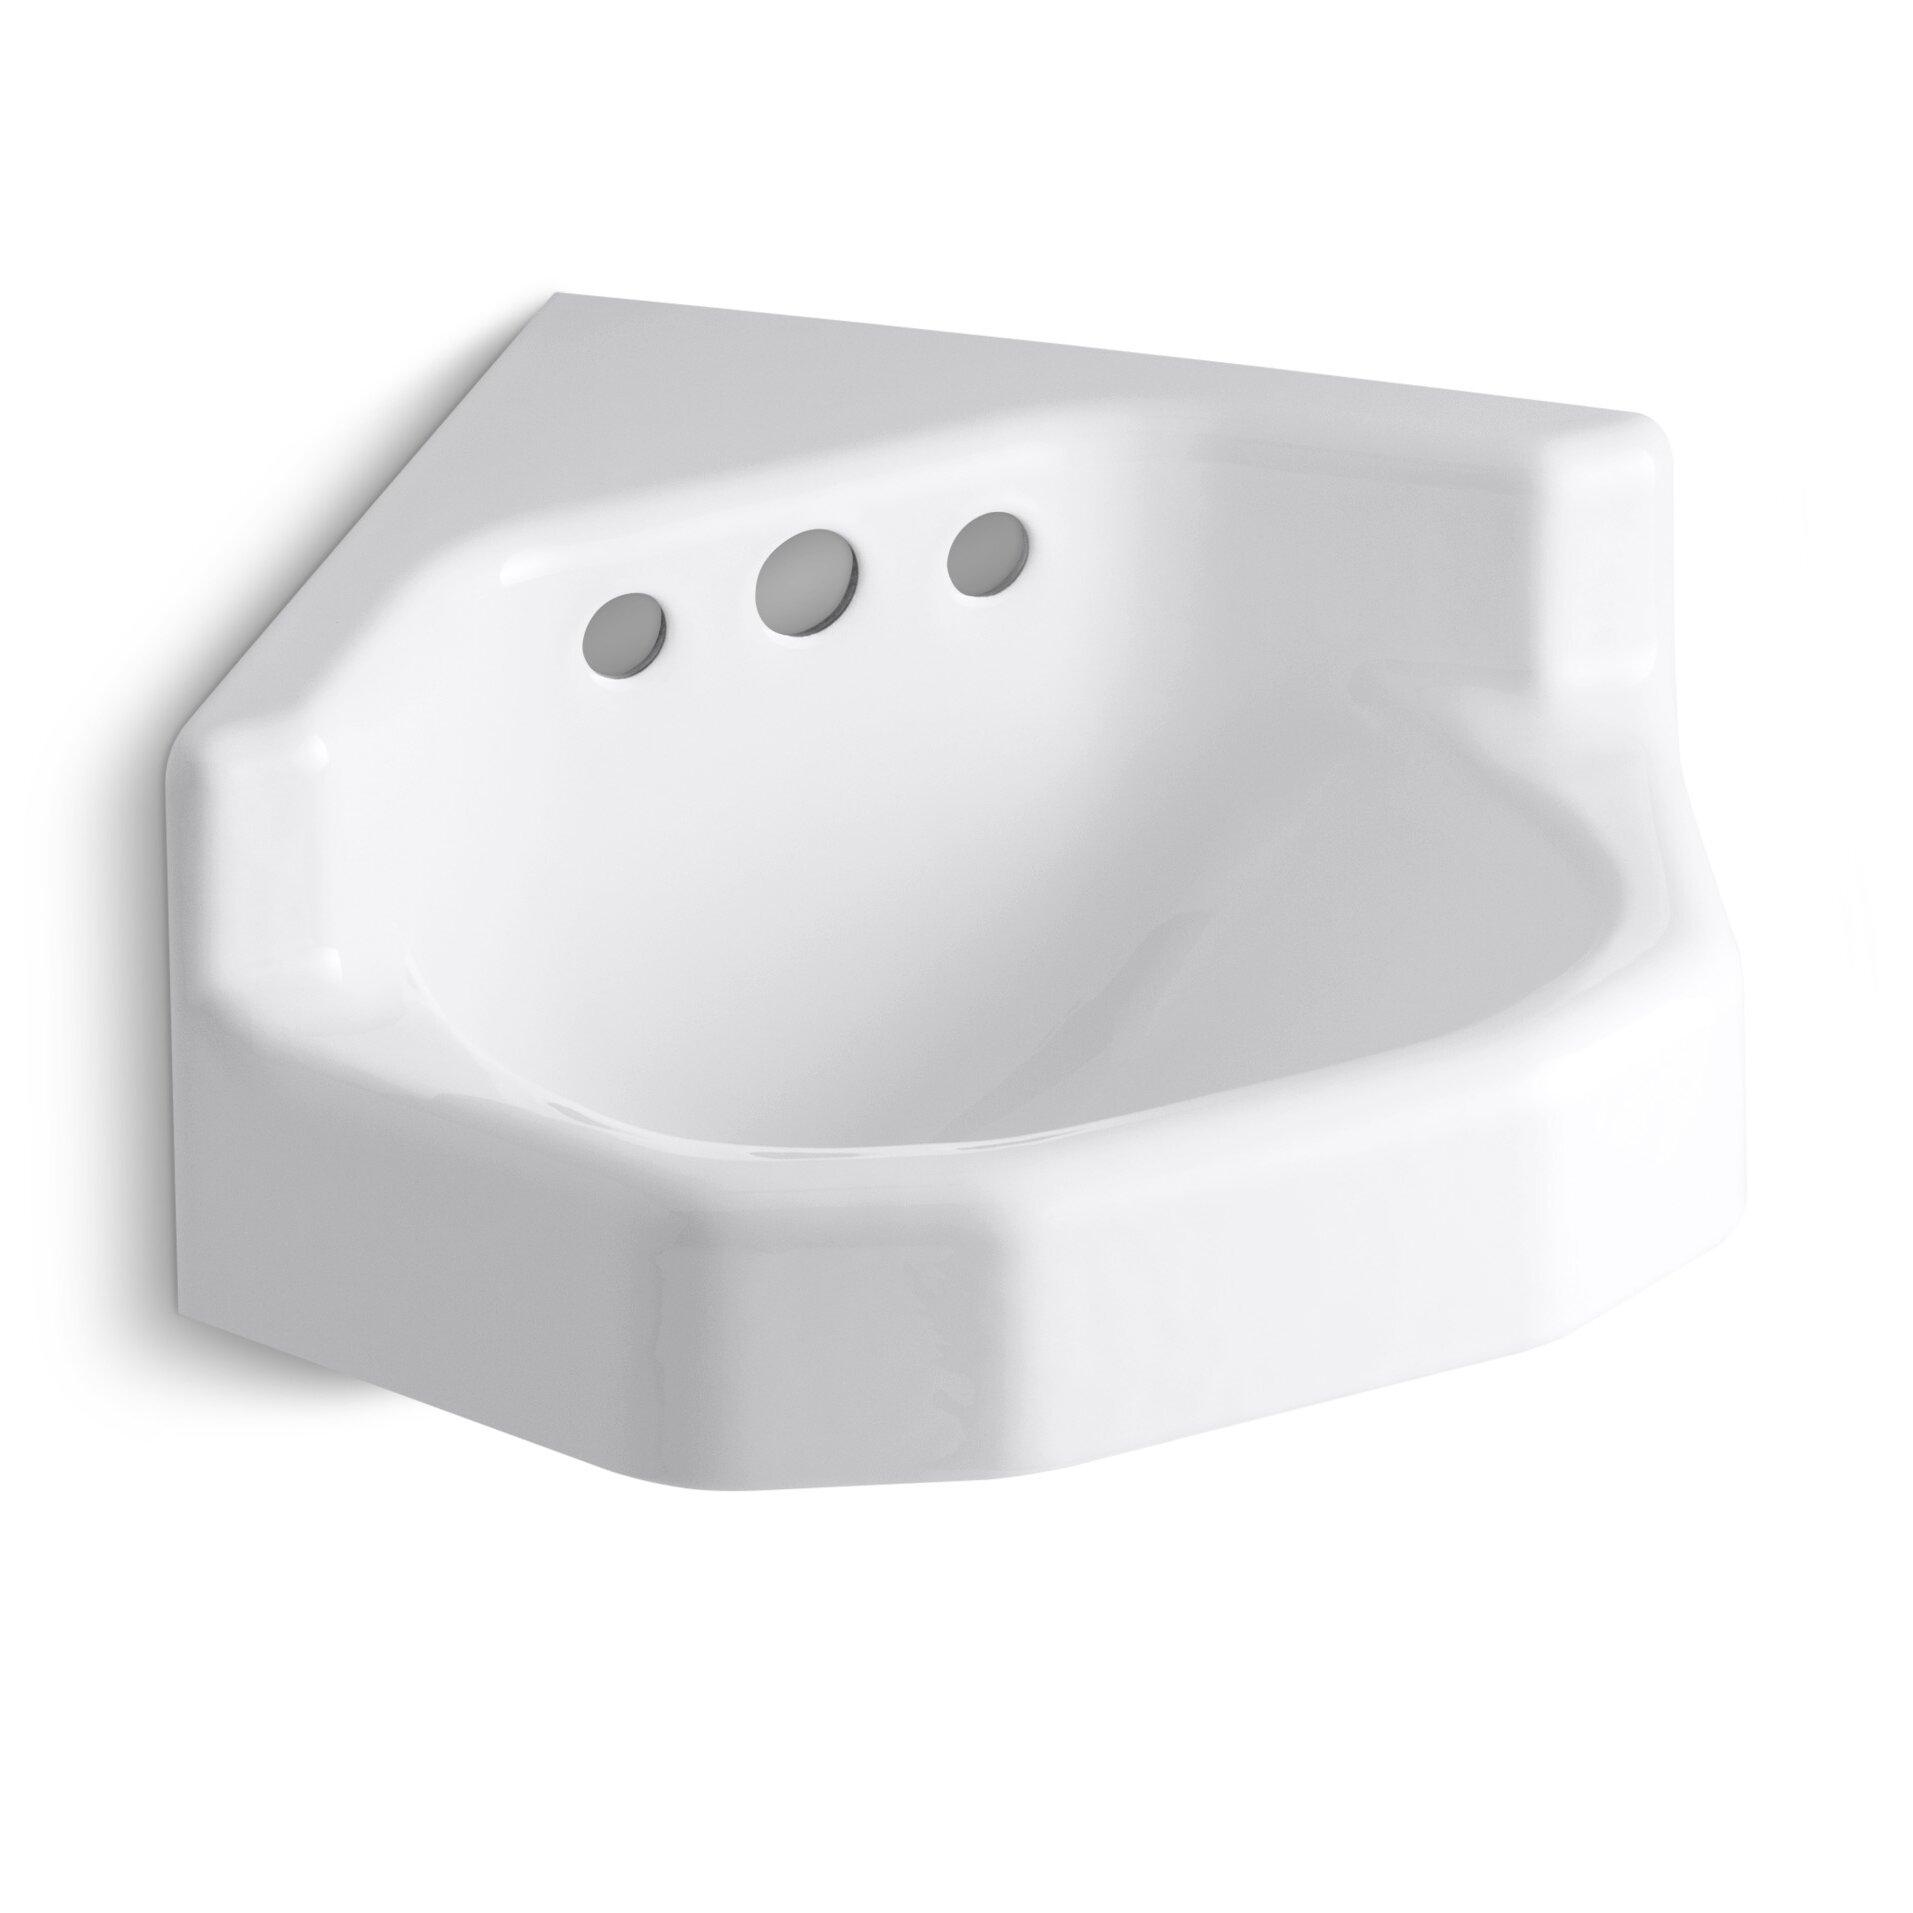 Kohler Marston 16 X 16 Corner Wall Mount Shelf Back Bathroom Sink Reviews Wayfair